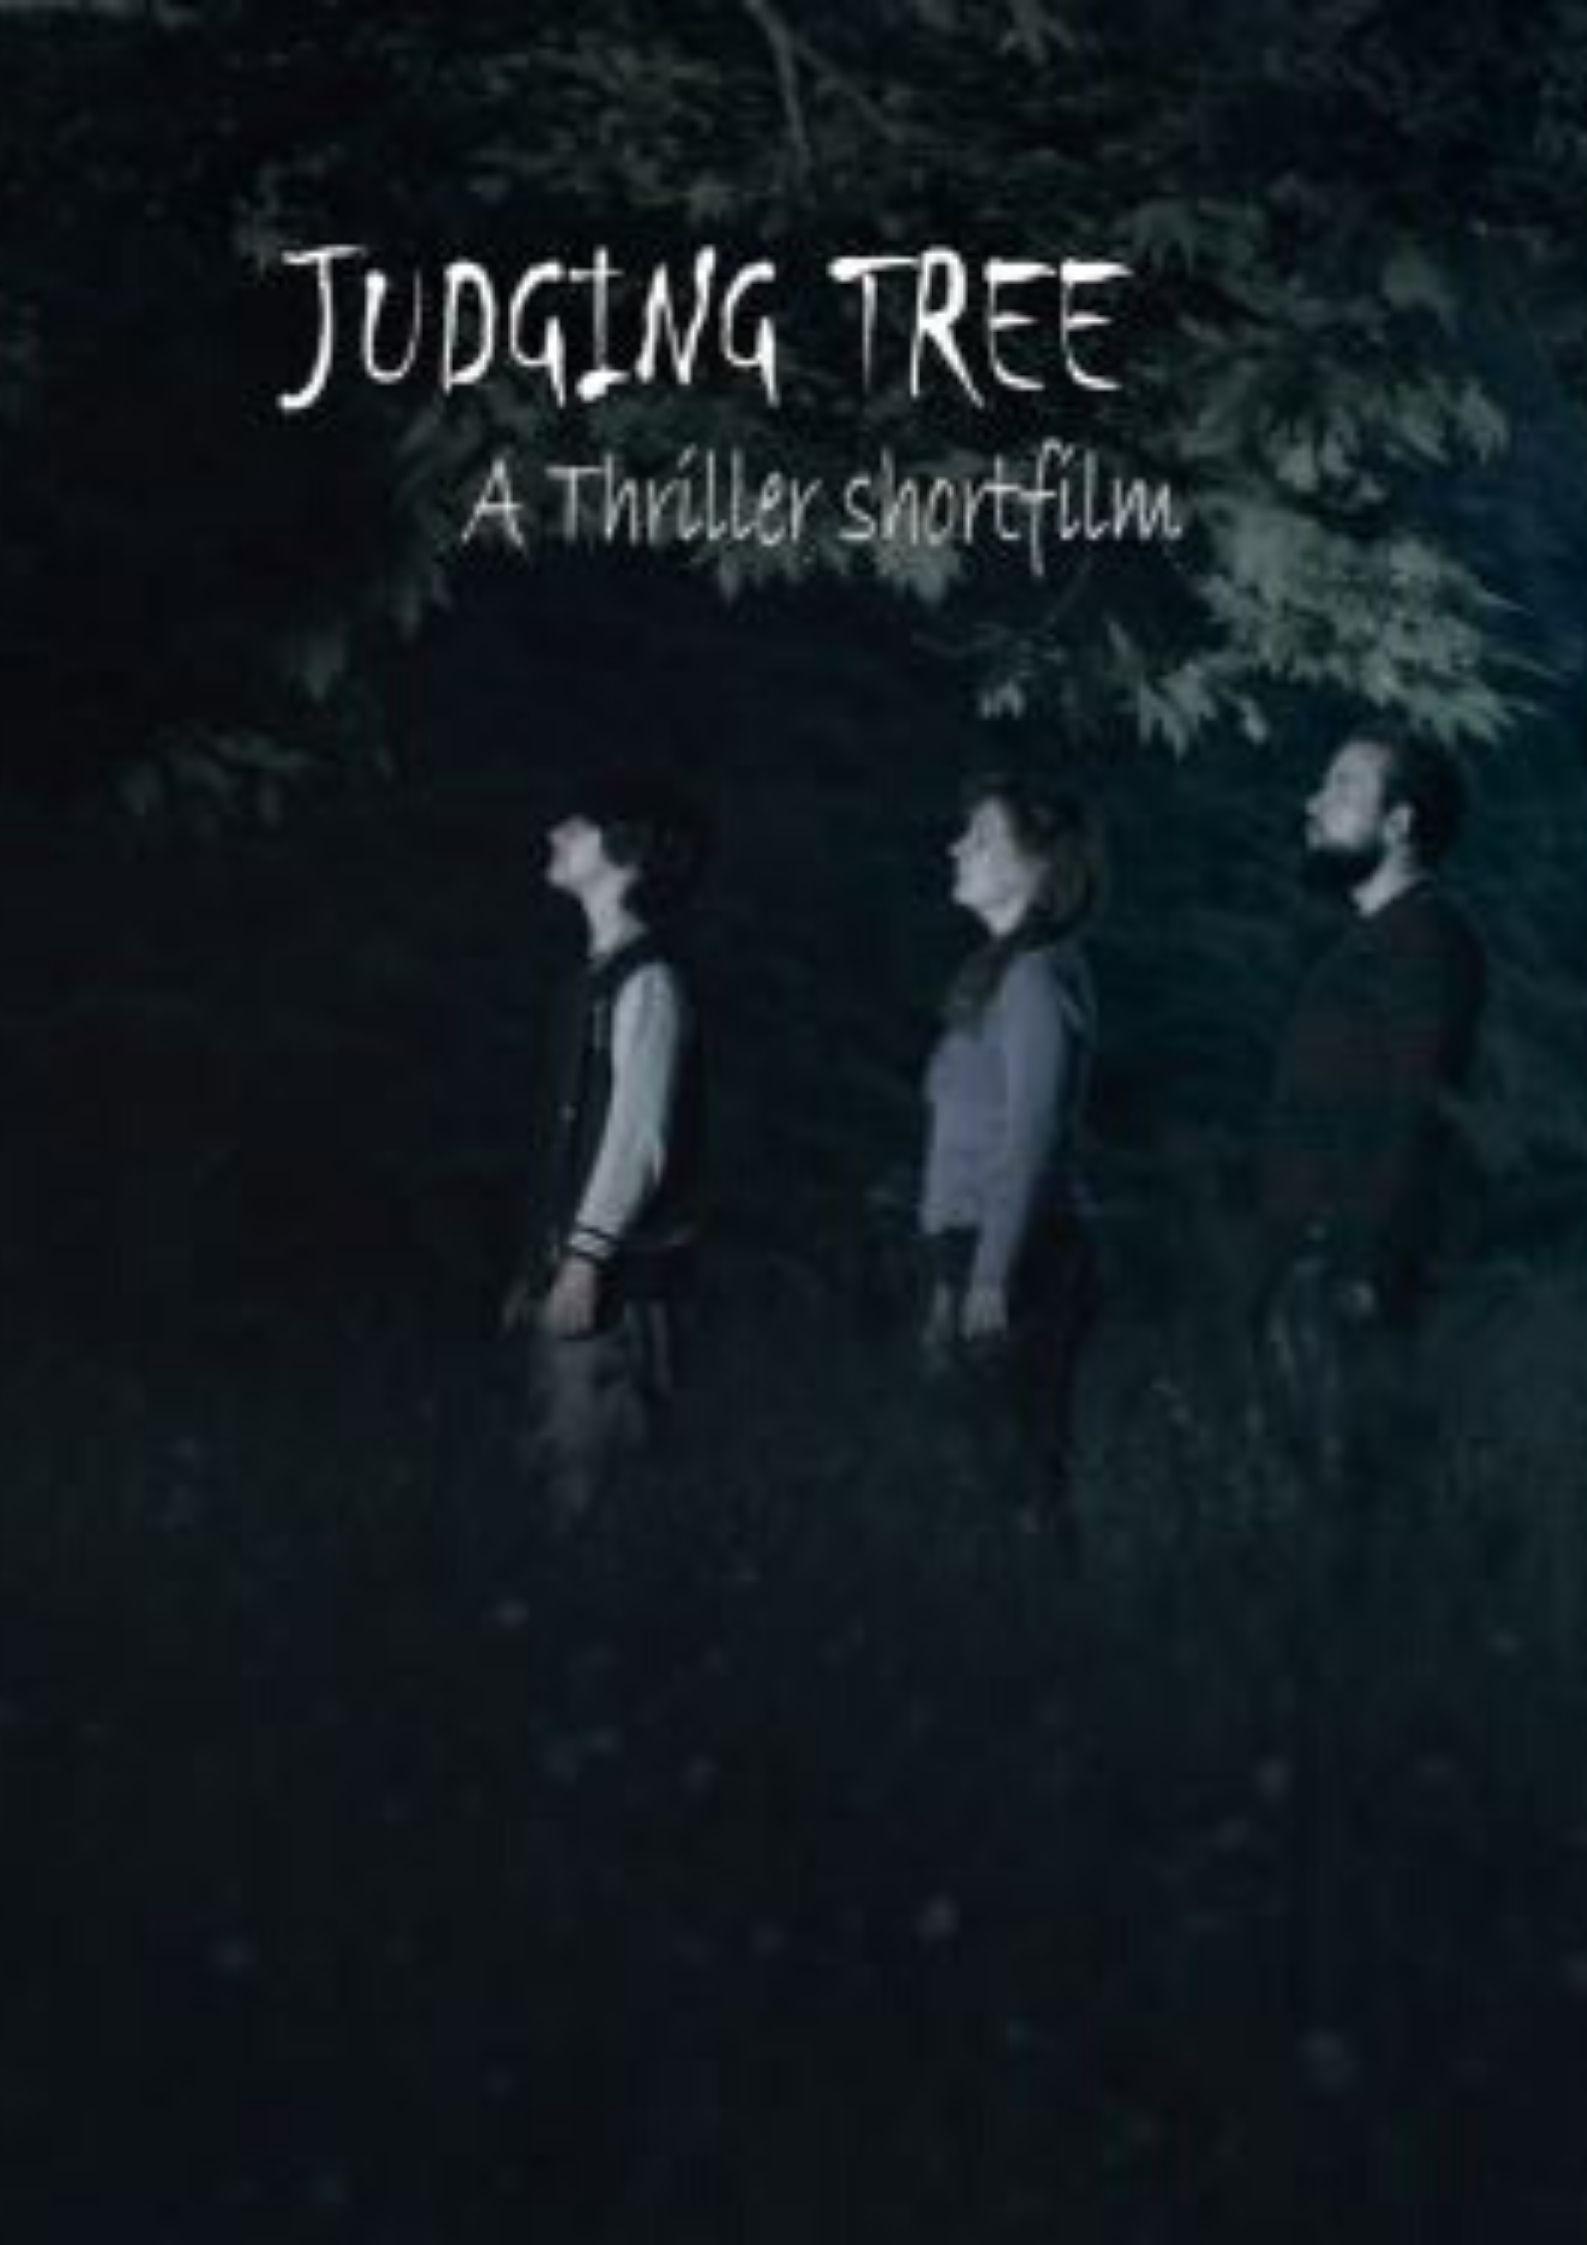 Judging Tree UK Film Channel